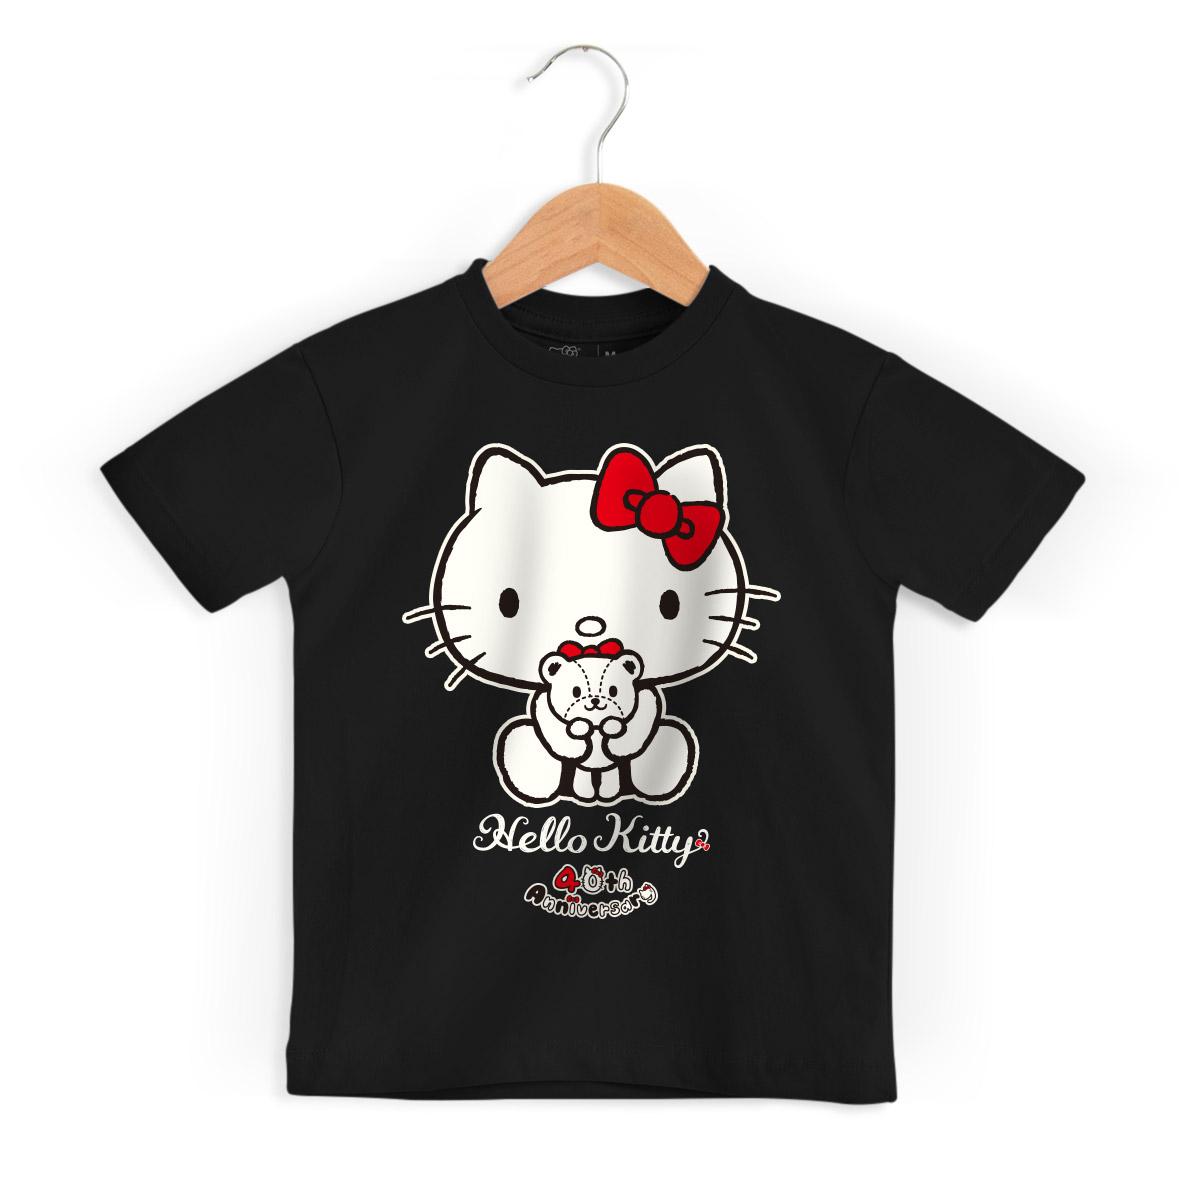 Camiseta Infantil Hello Kitty 40th Ribbon 2